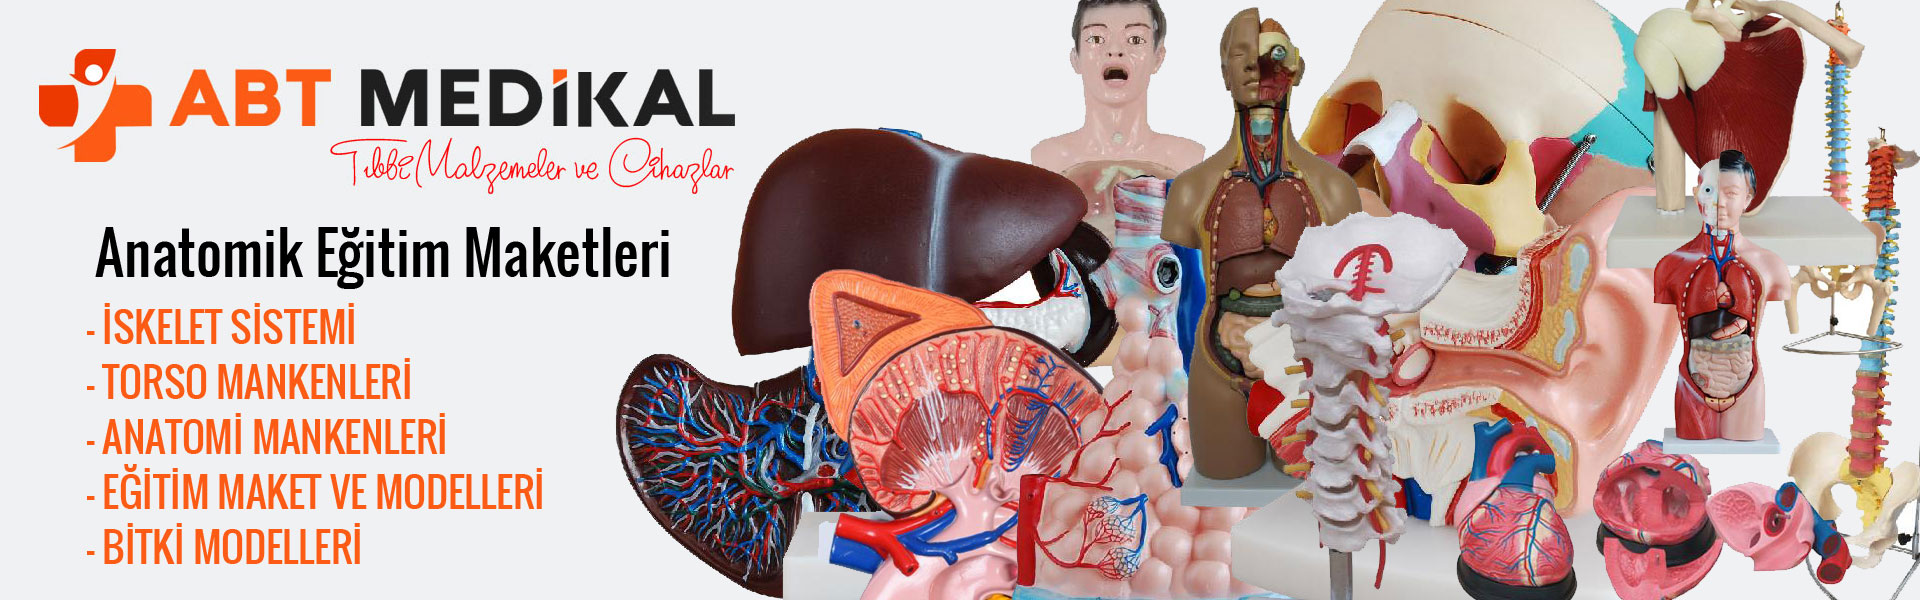 anatomik-egitim-maketleri-toptan-ve-parekende-satisi